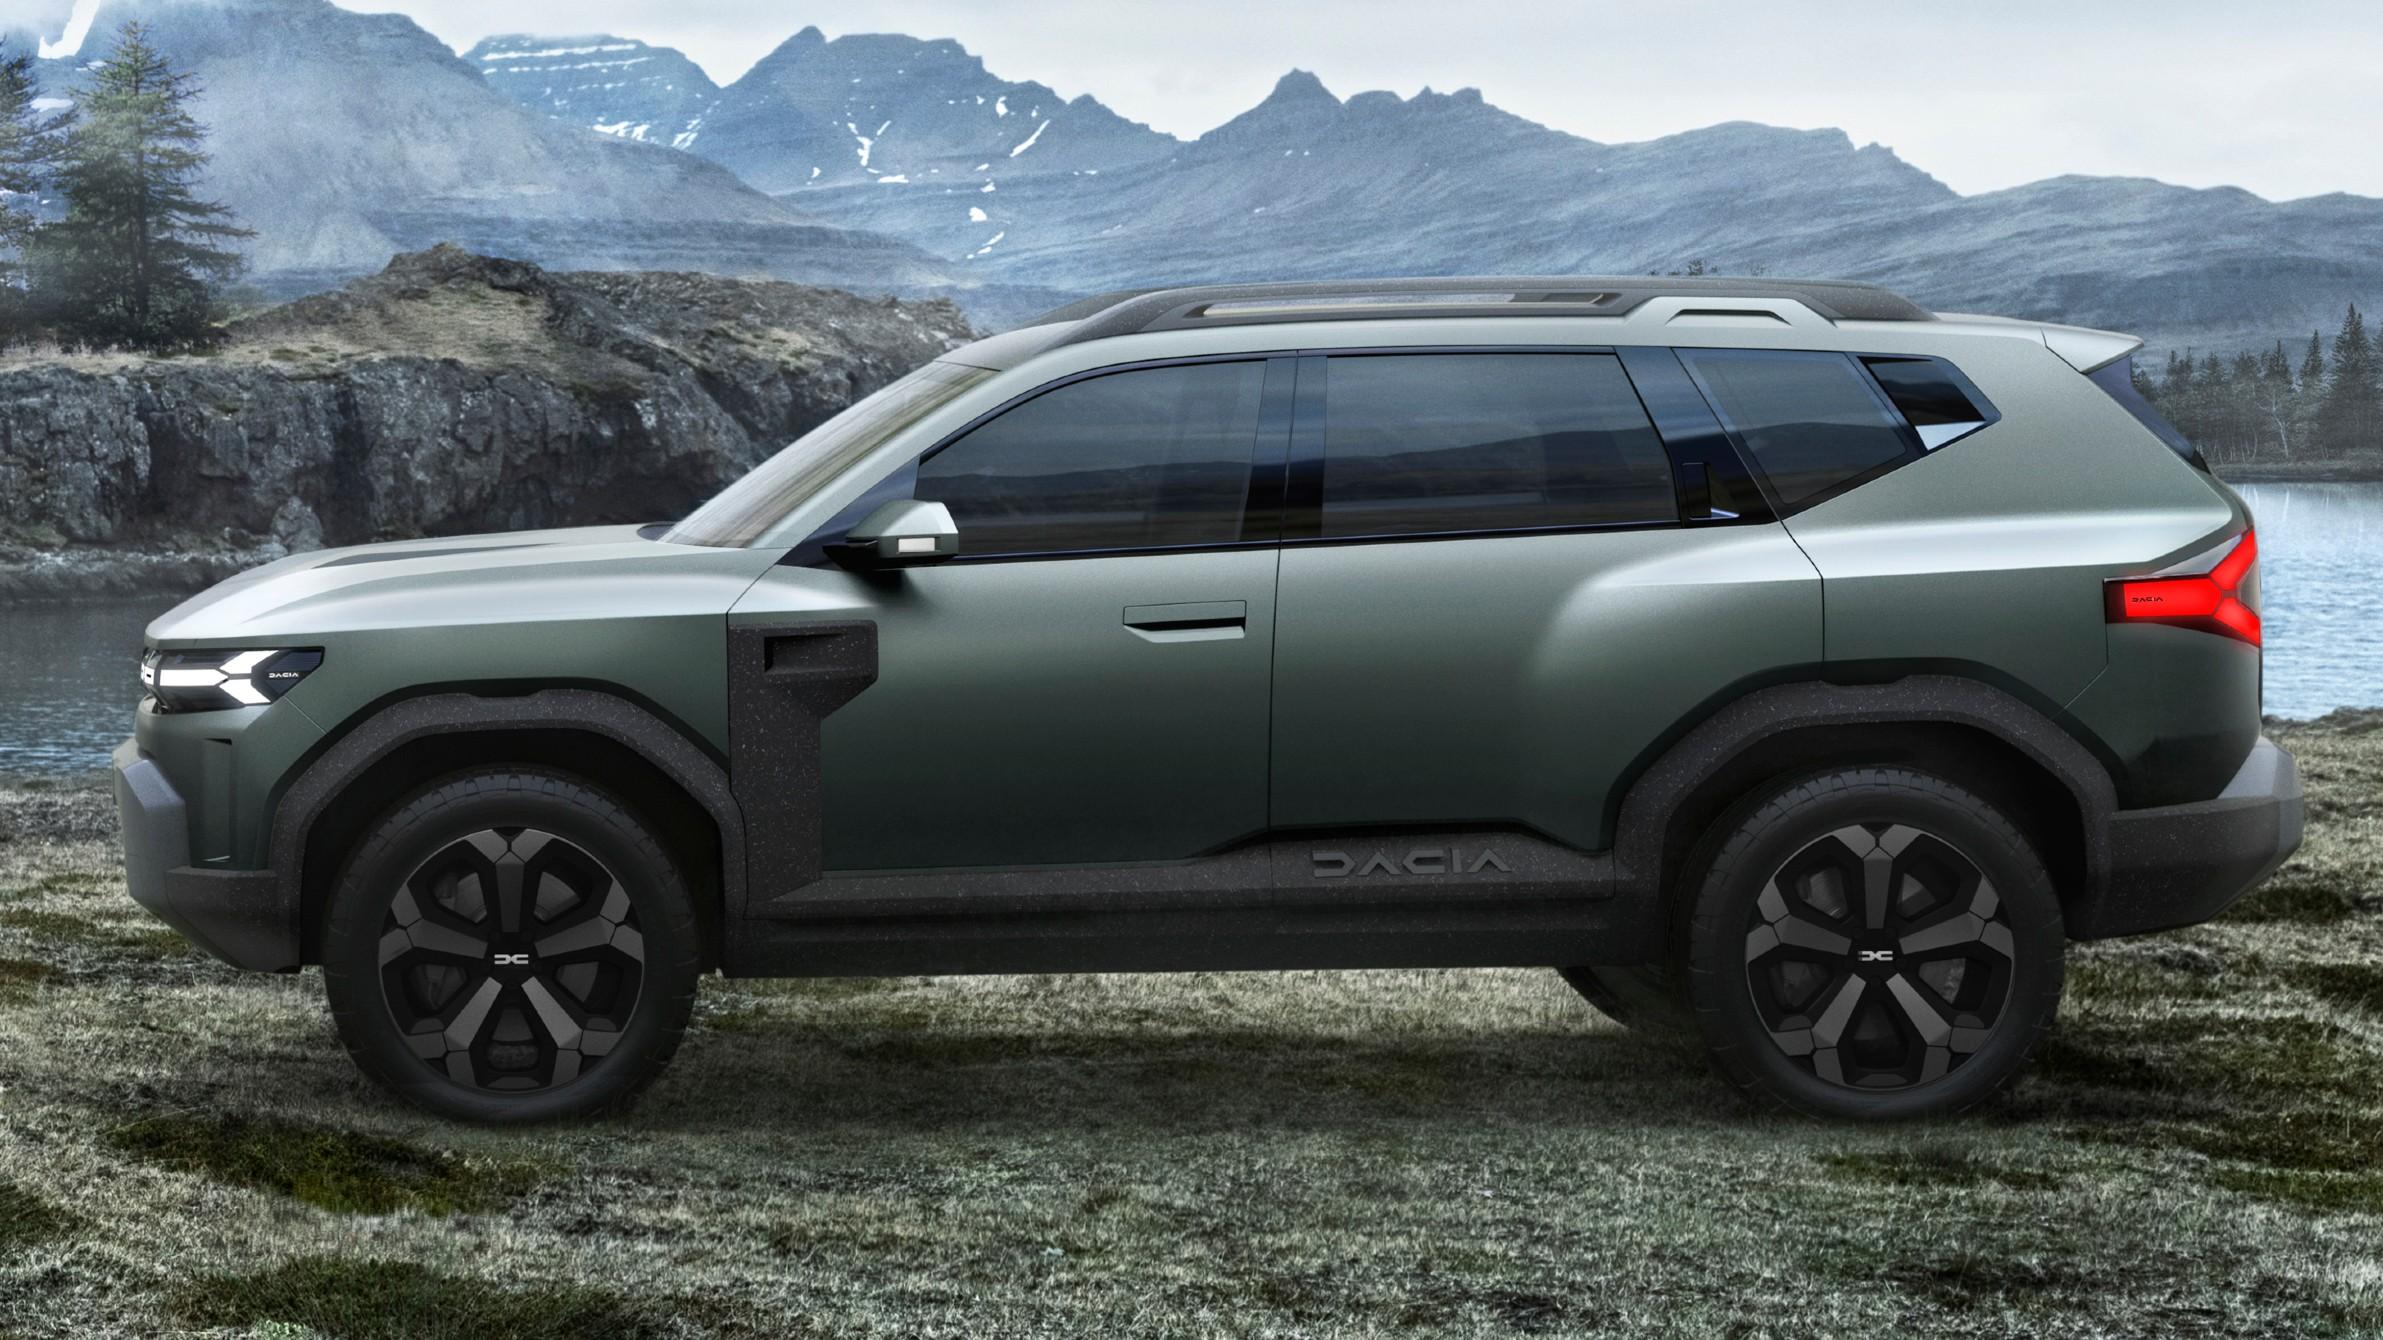 Bigster: Το νέο προσιτό και σκληροτράχηλο SUV της Dacia [vid]